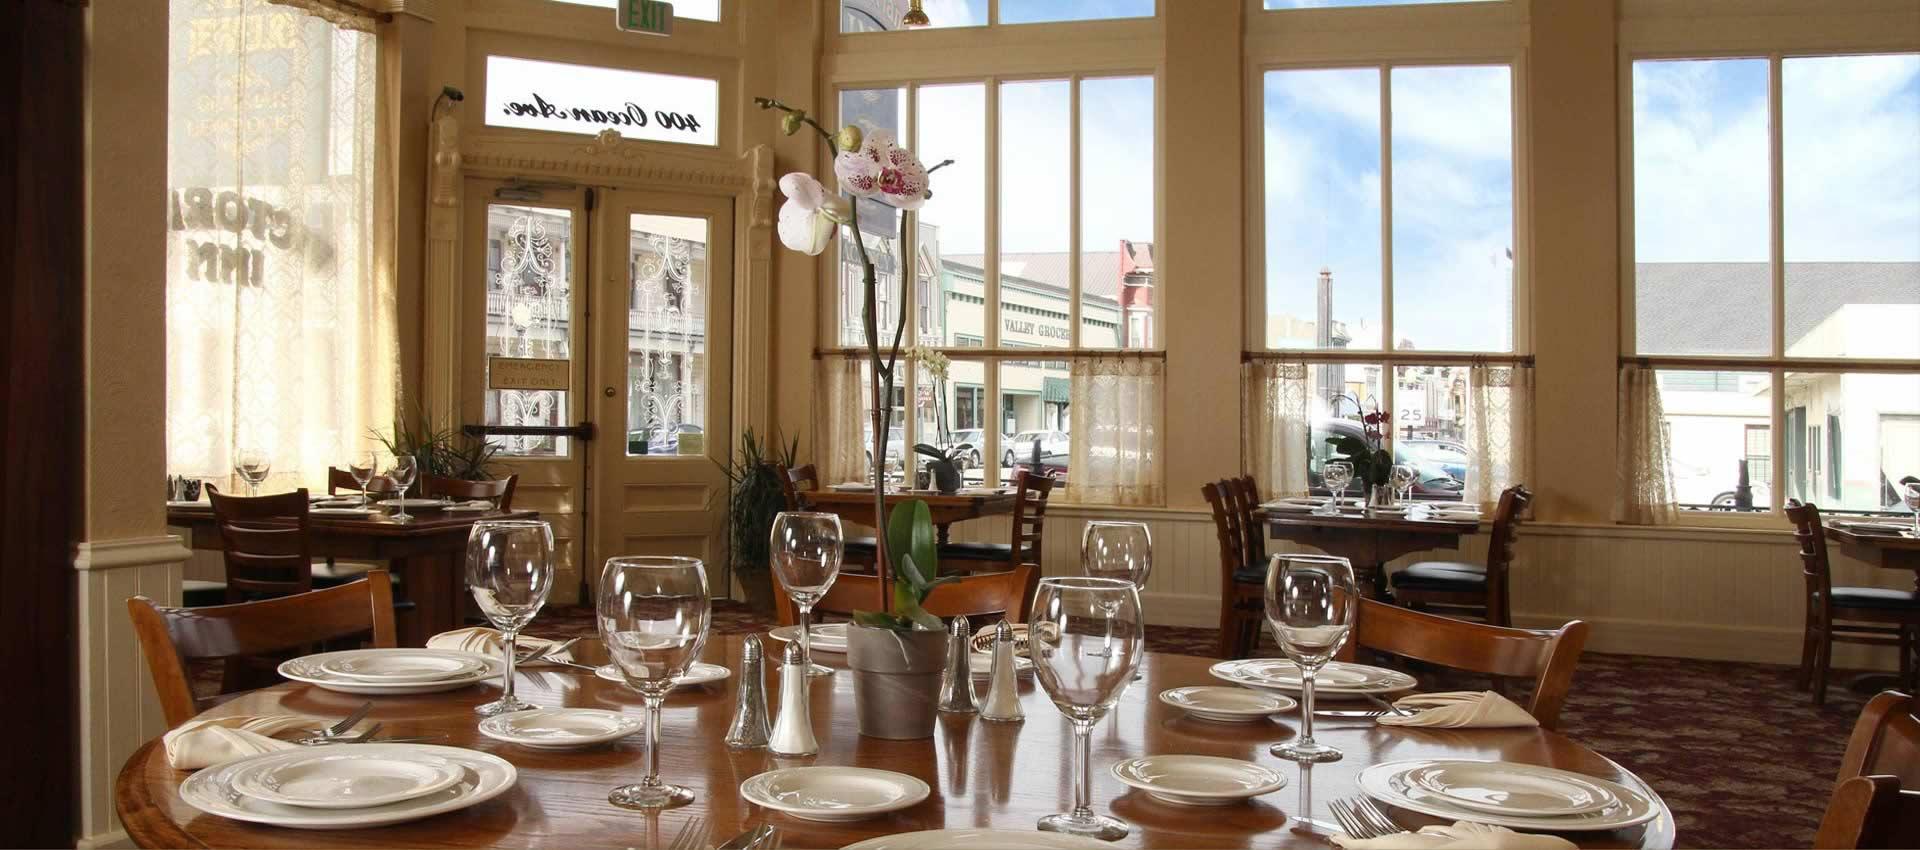 redwood suites Victorian Inn Restaurant